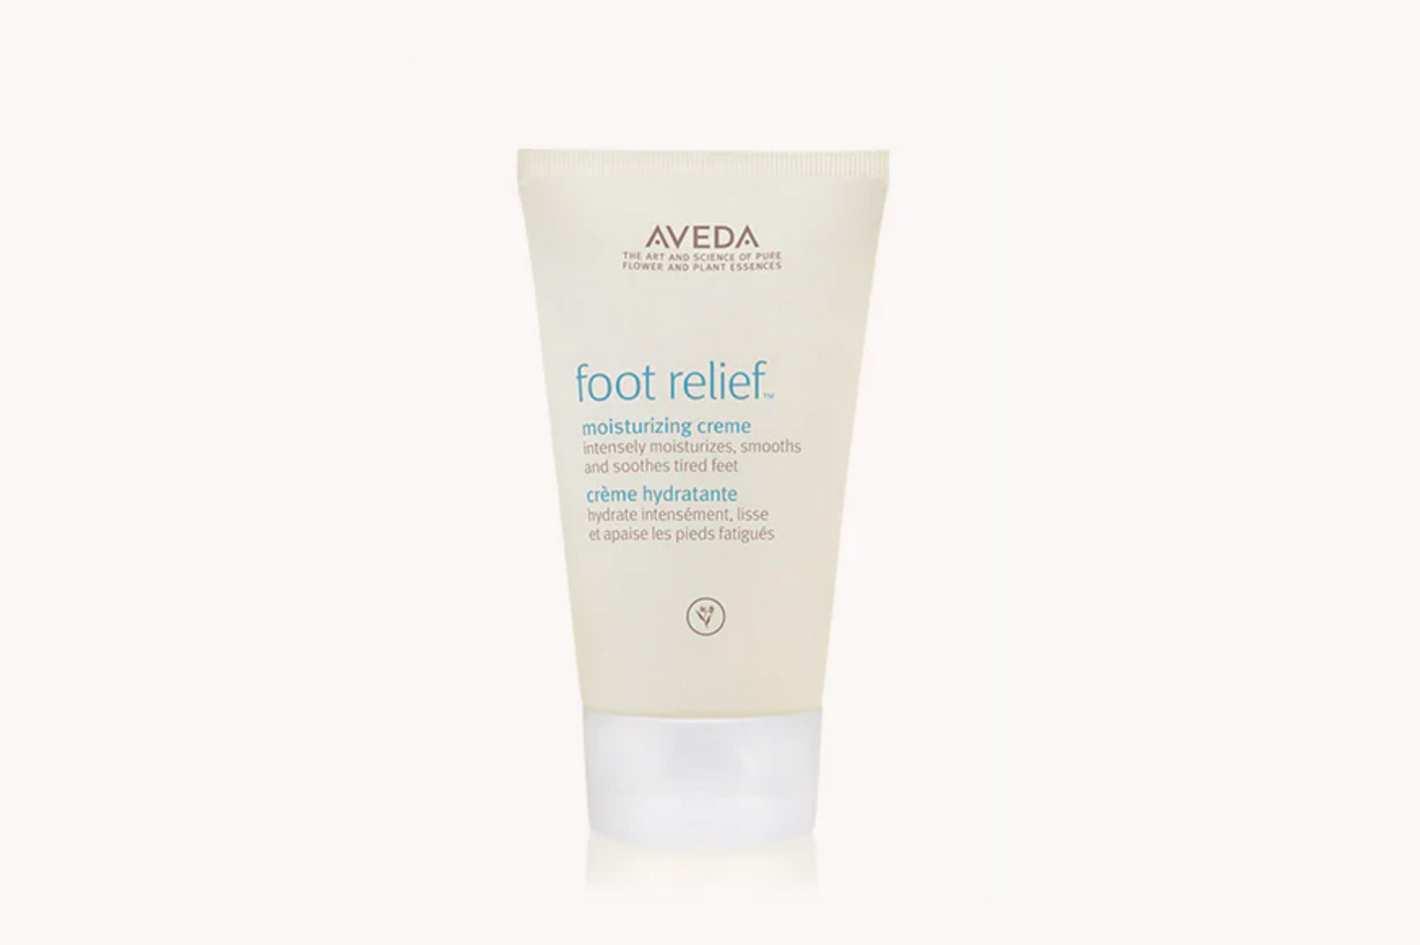 Aveda Foot Relief Moisturizing Creme, 1.4 oz